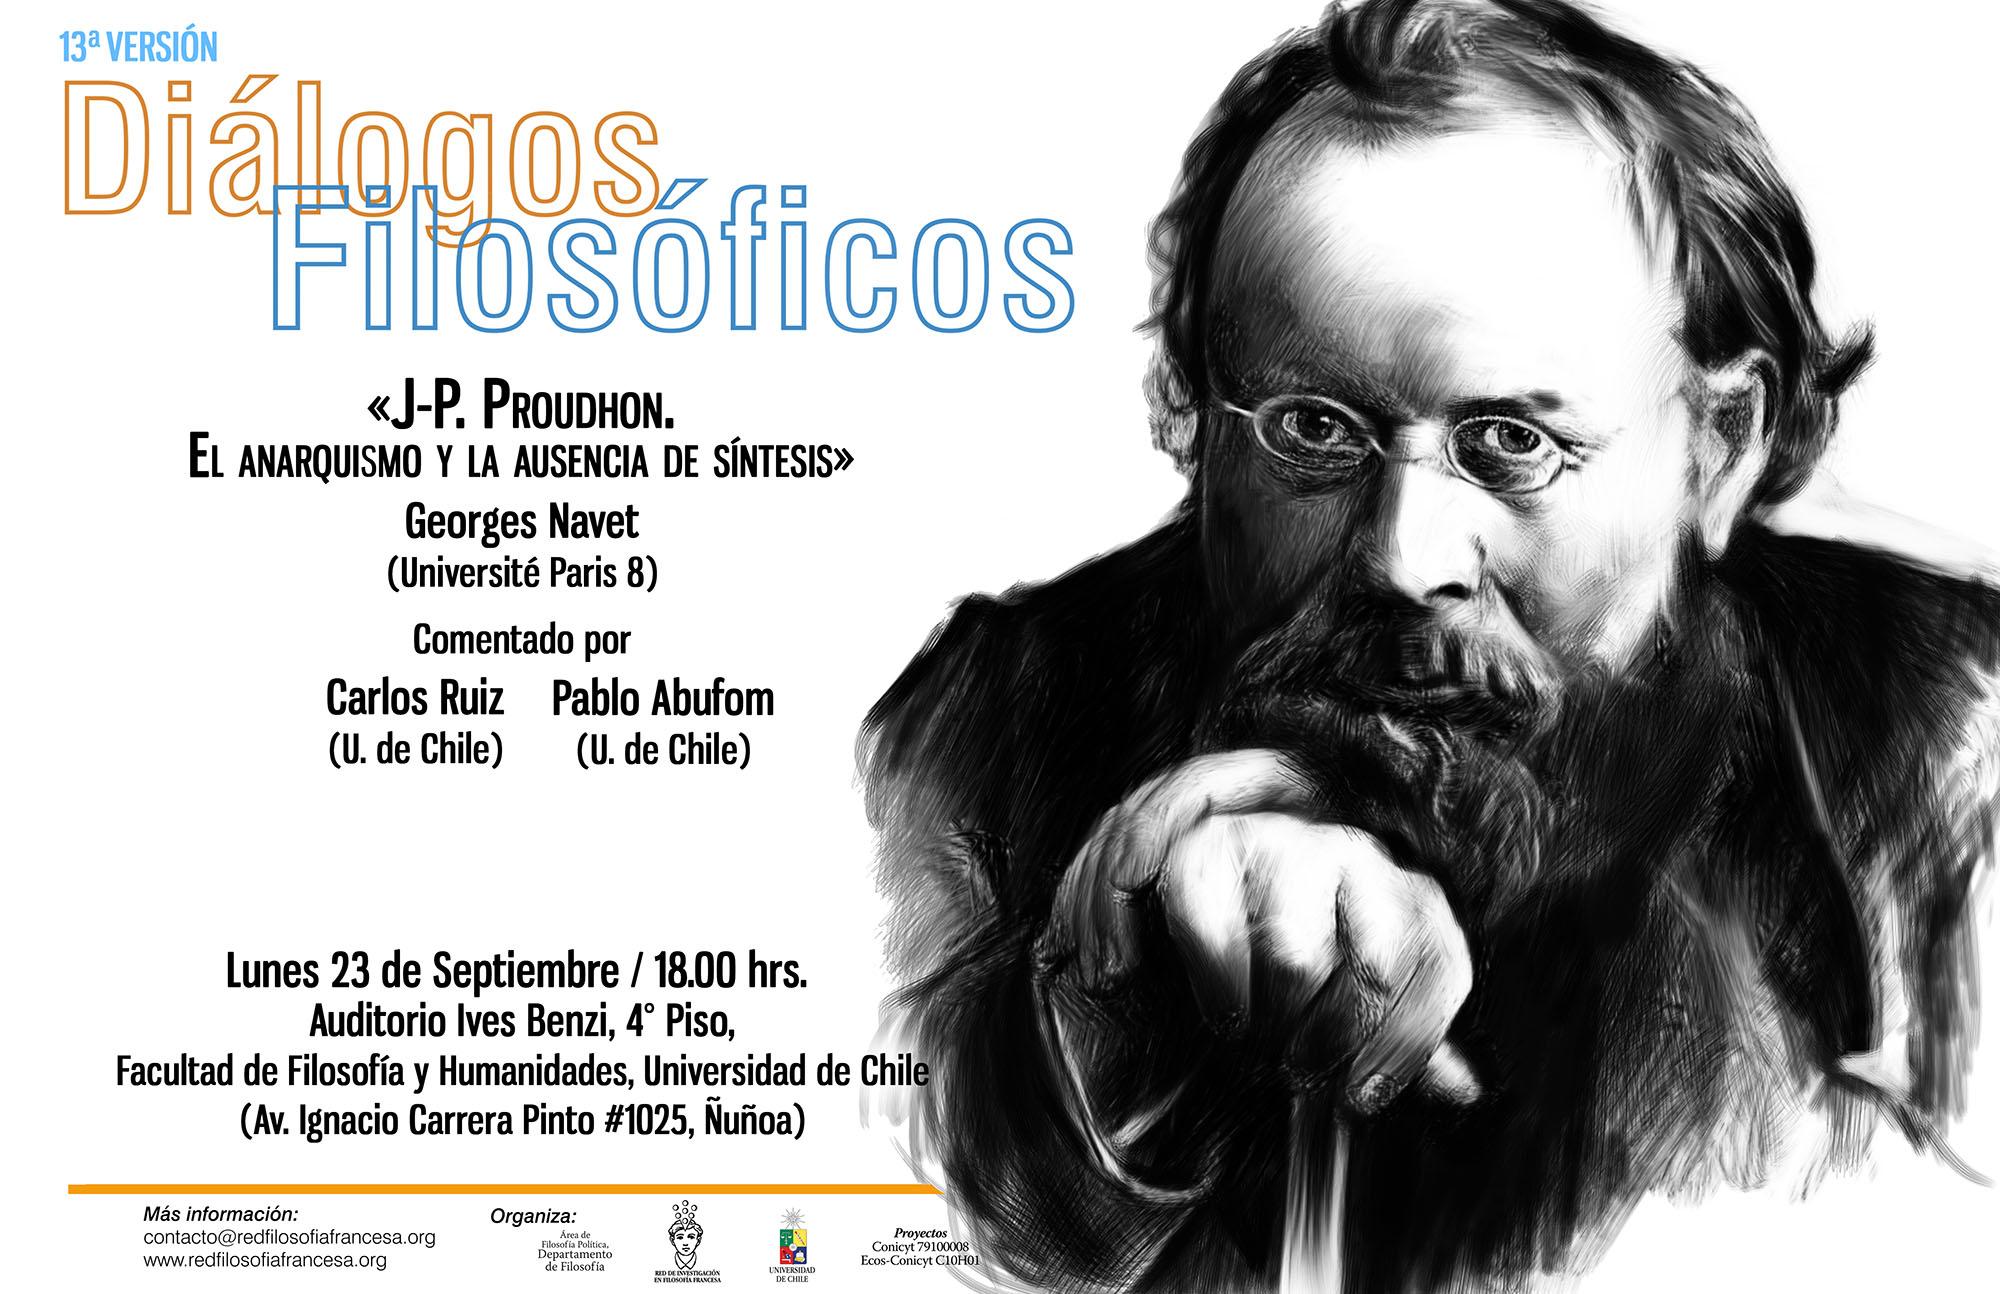 http://redfilosofiafrancesa.files.wordpress.com/2013/09/afiche-navet-web.jpg